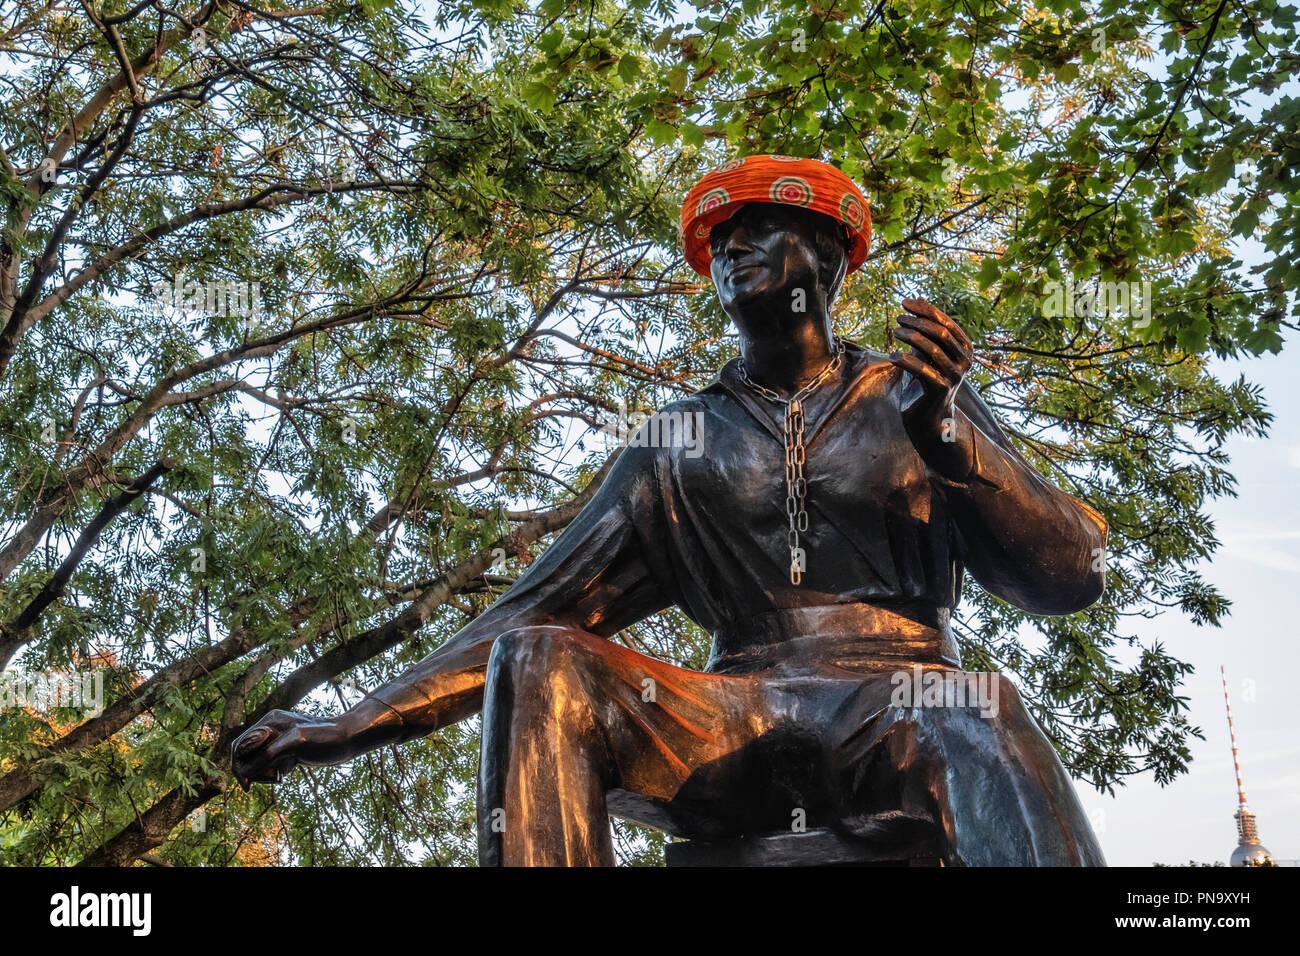 Berlin Mitte. Public art -  sculpture of Poet, Heinrich Heine monument - by sculptor, Waldemar Grzimek.                    A passerby has provided the - Stock Image